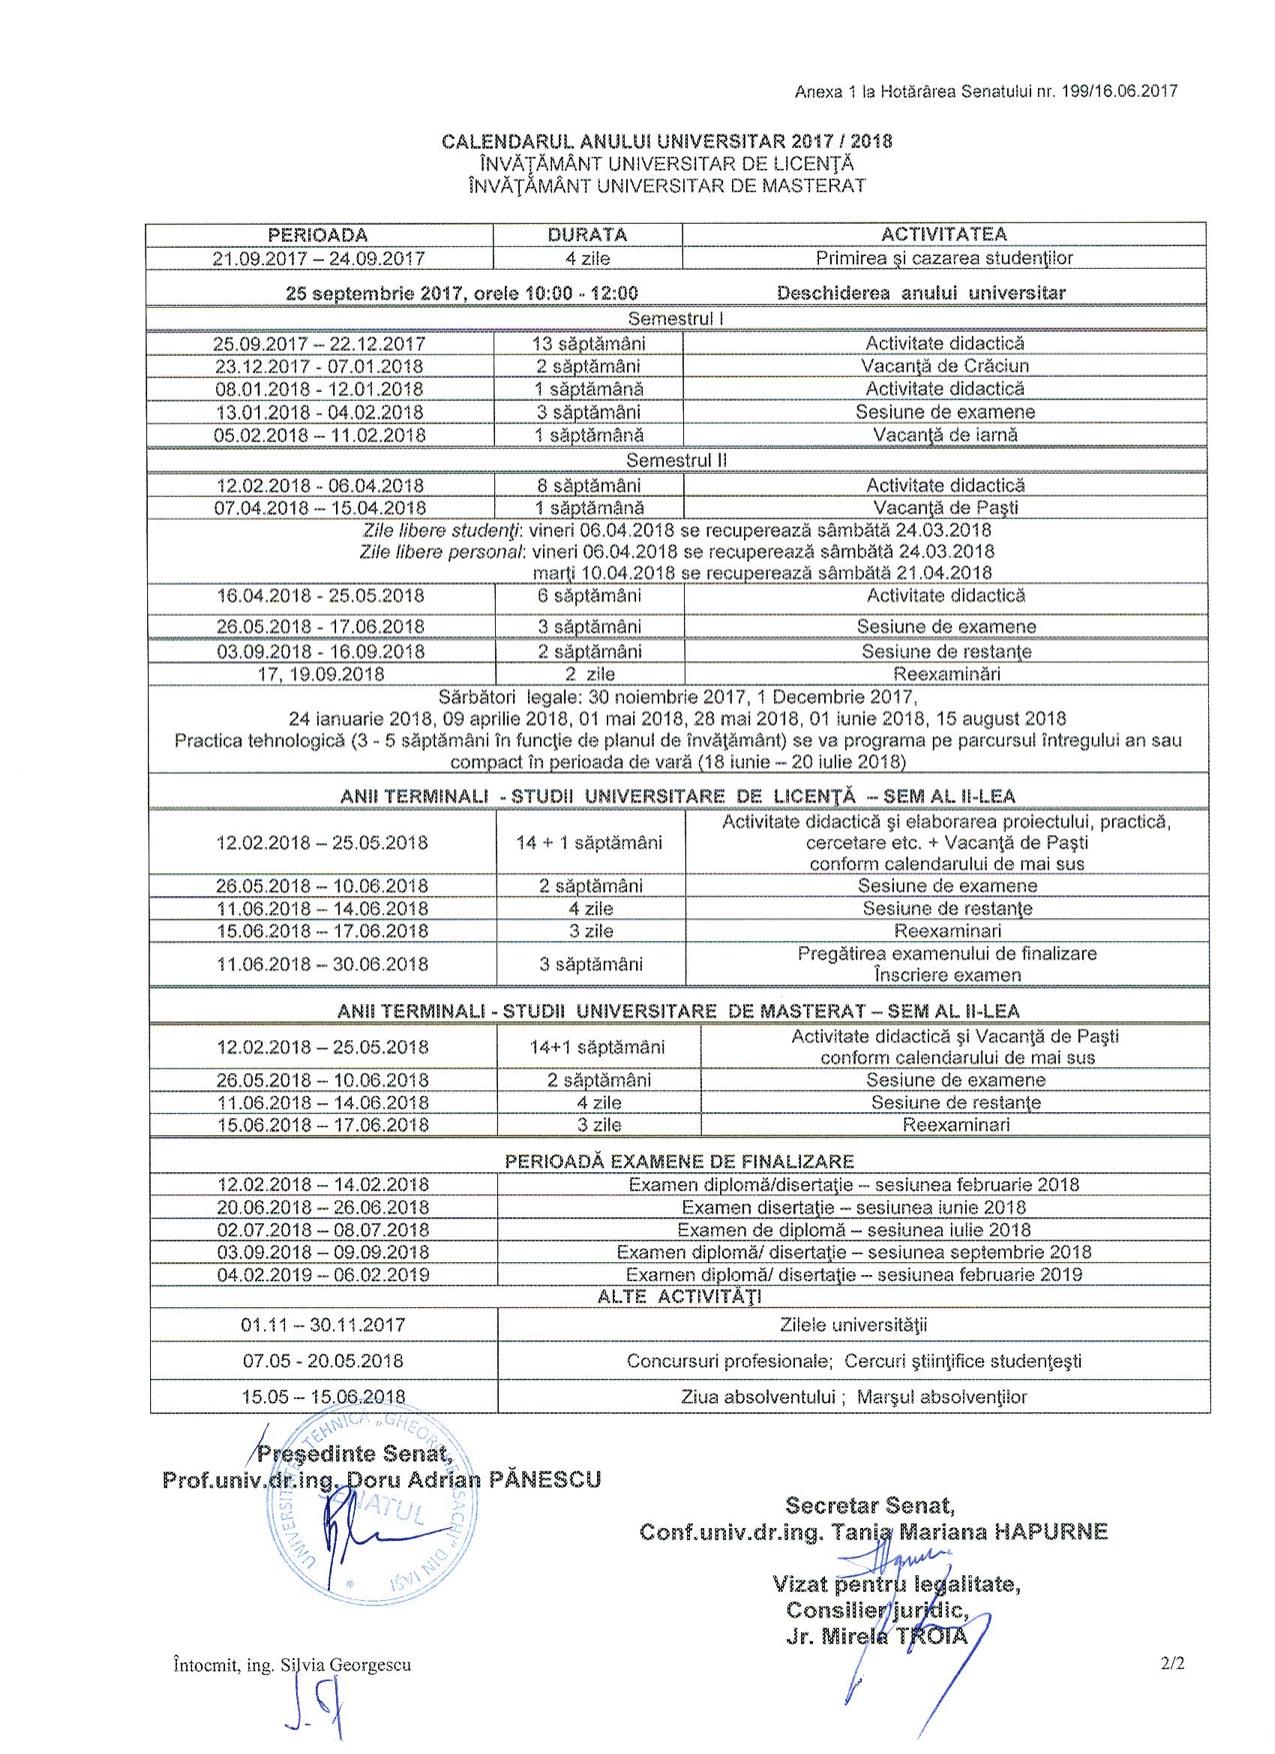 Calendar-an-universitar-2017-2018  Calendar an universitar TUIASI 2017-2018 Calendar an universitar 2017 2018